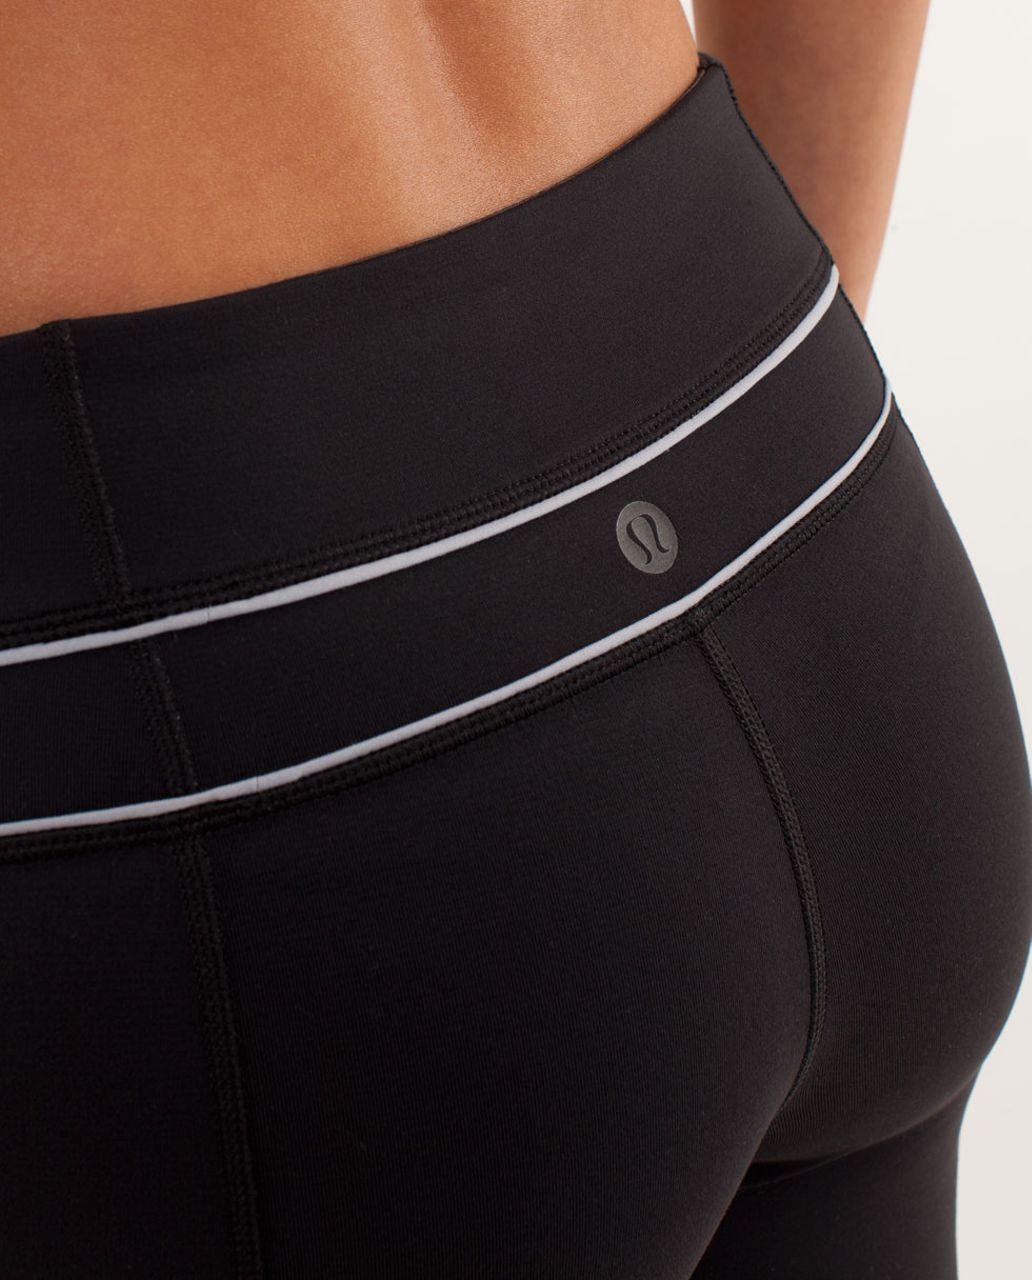 Lululemon Groove Pant *Silver Slim (Regular) - Black / Silver Slate